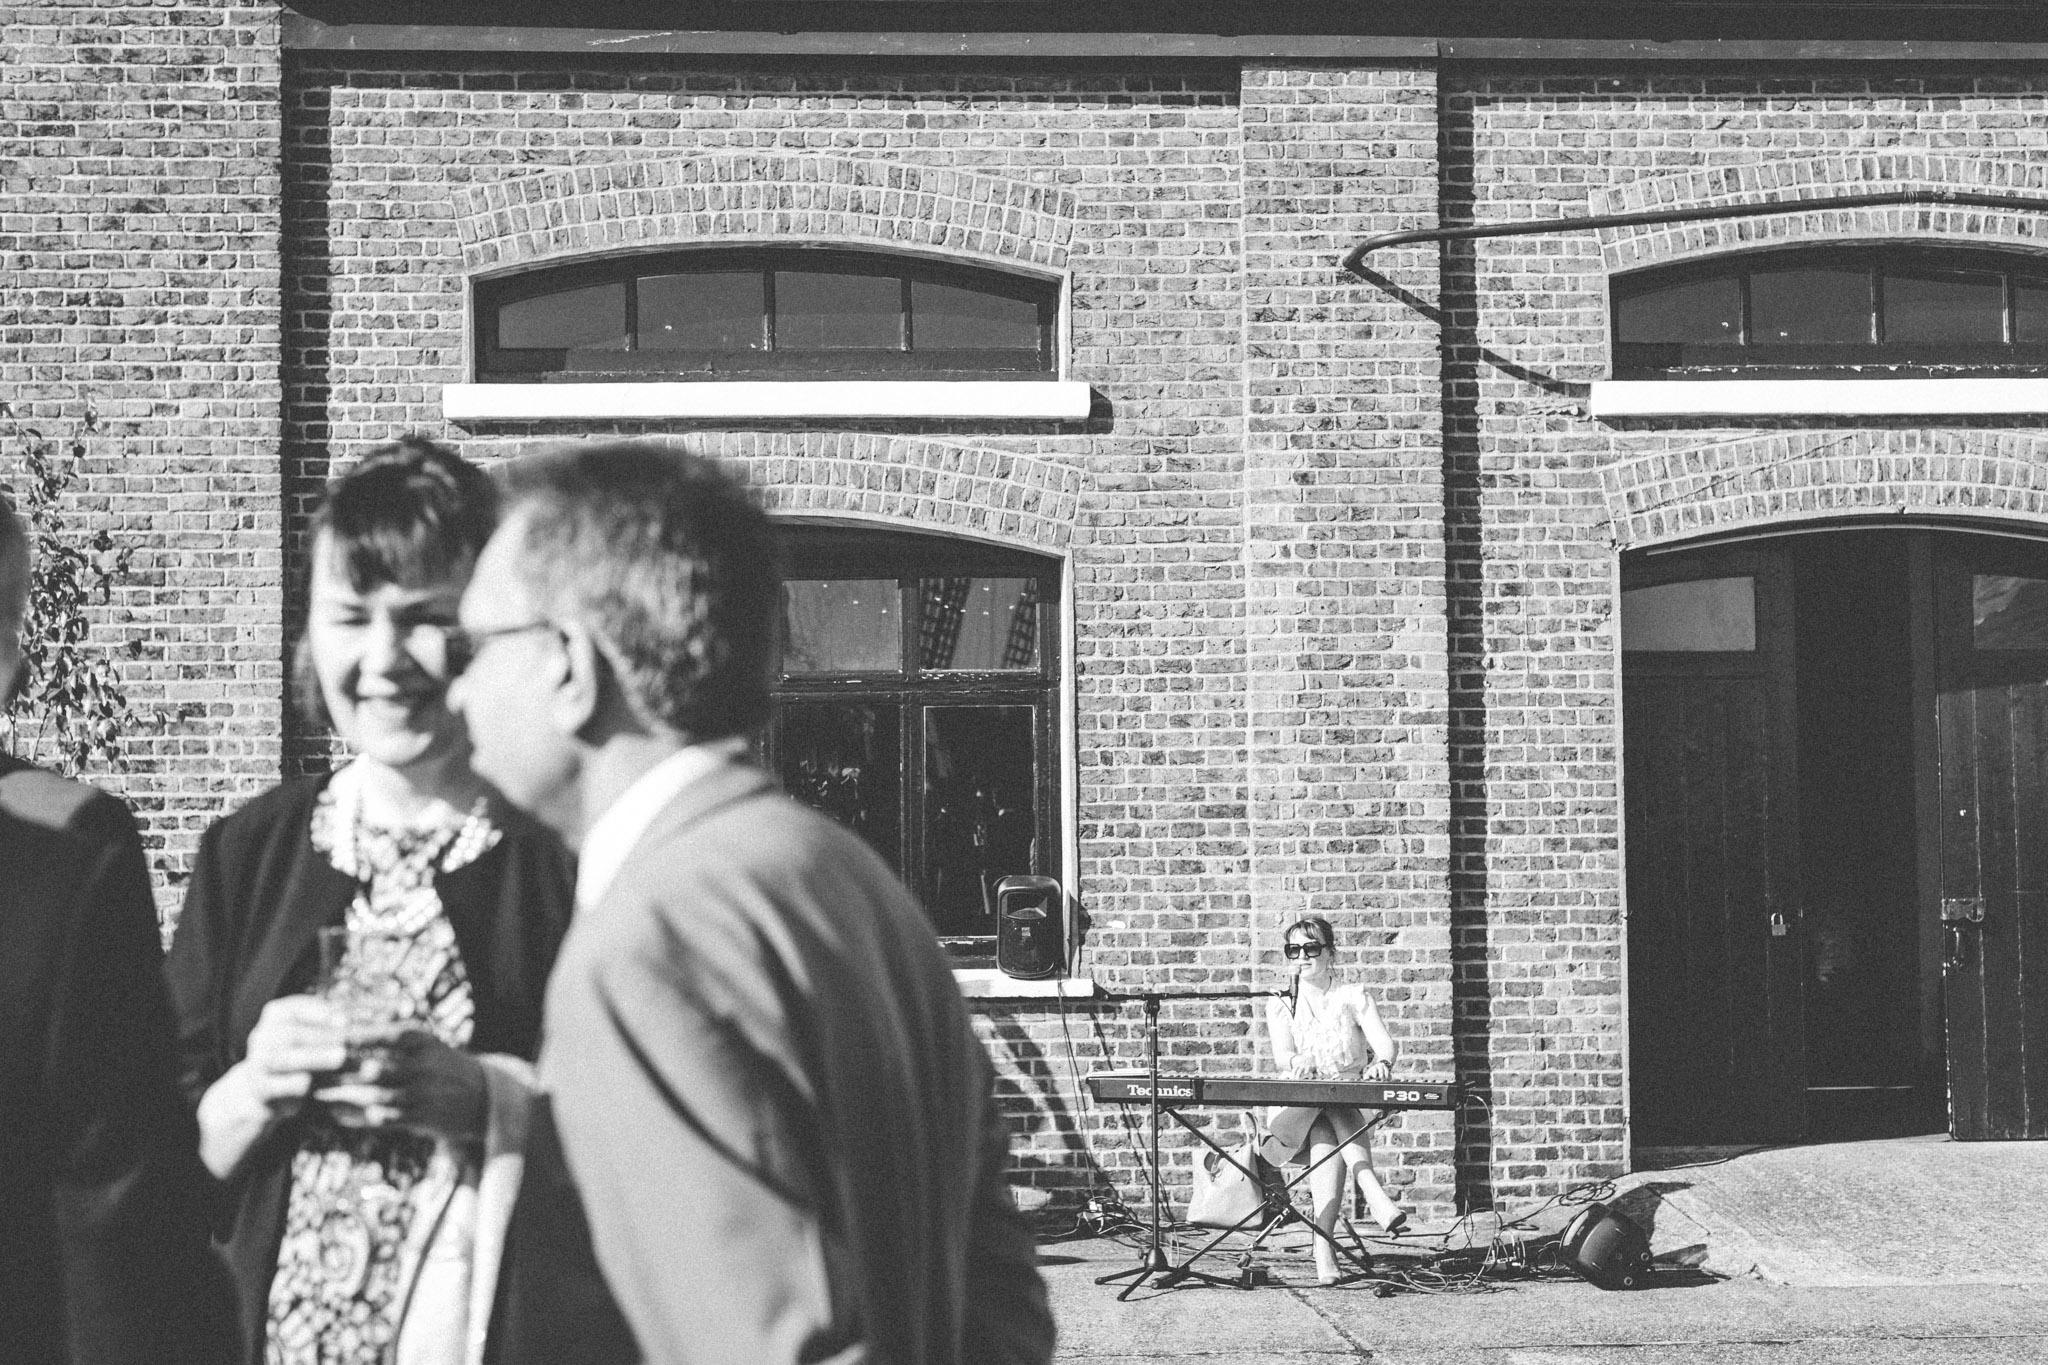 trinity_buoy_wharf_hackney_town_hall_wedding_401.jpg